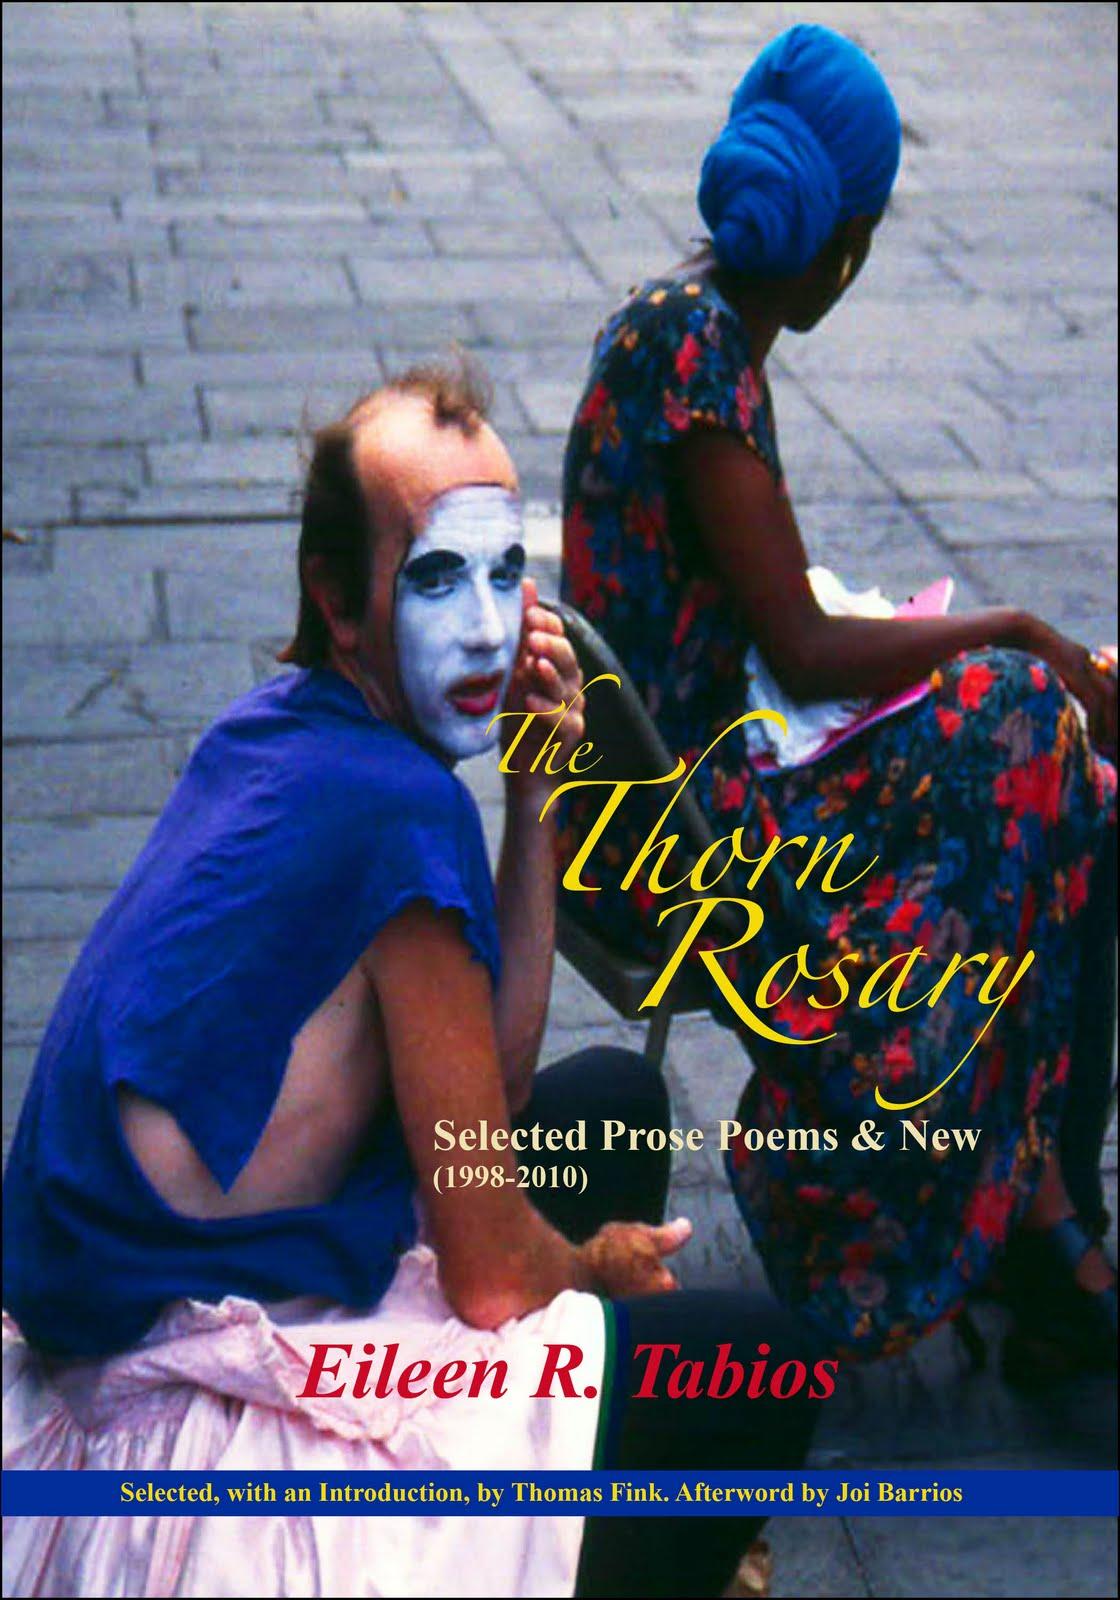 [THORN+ROSARY+cover.jpg]